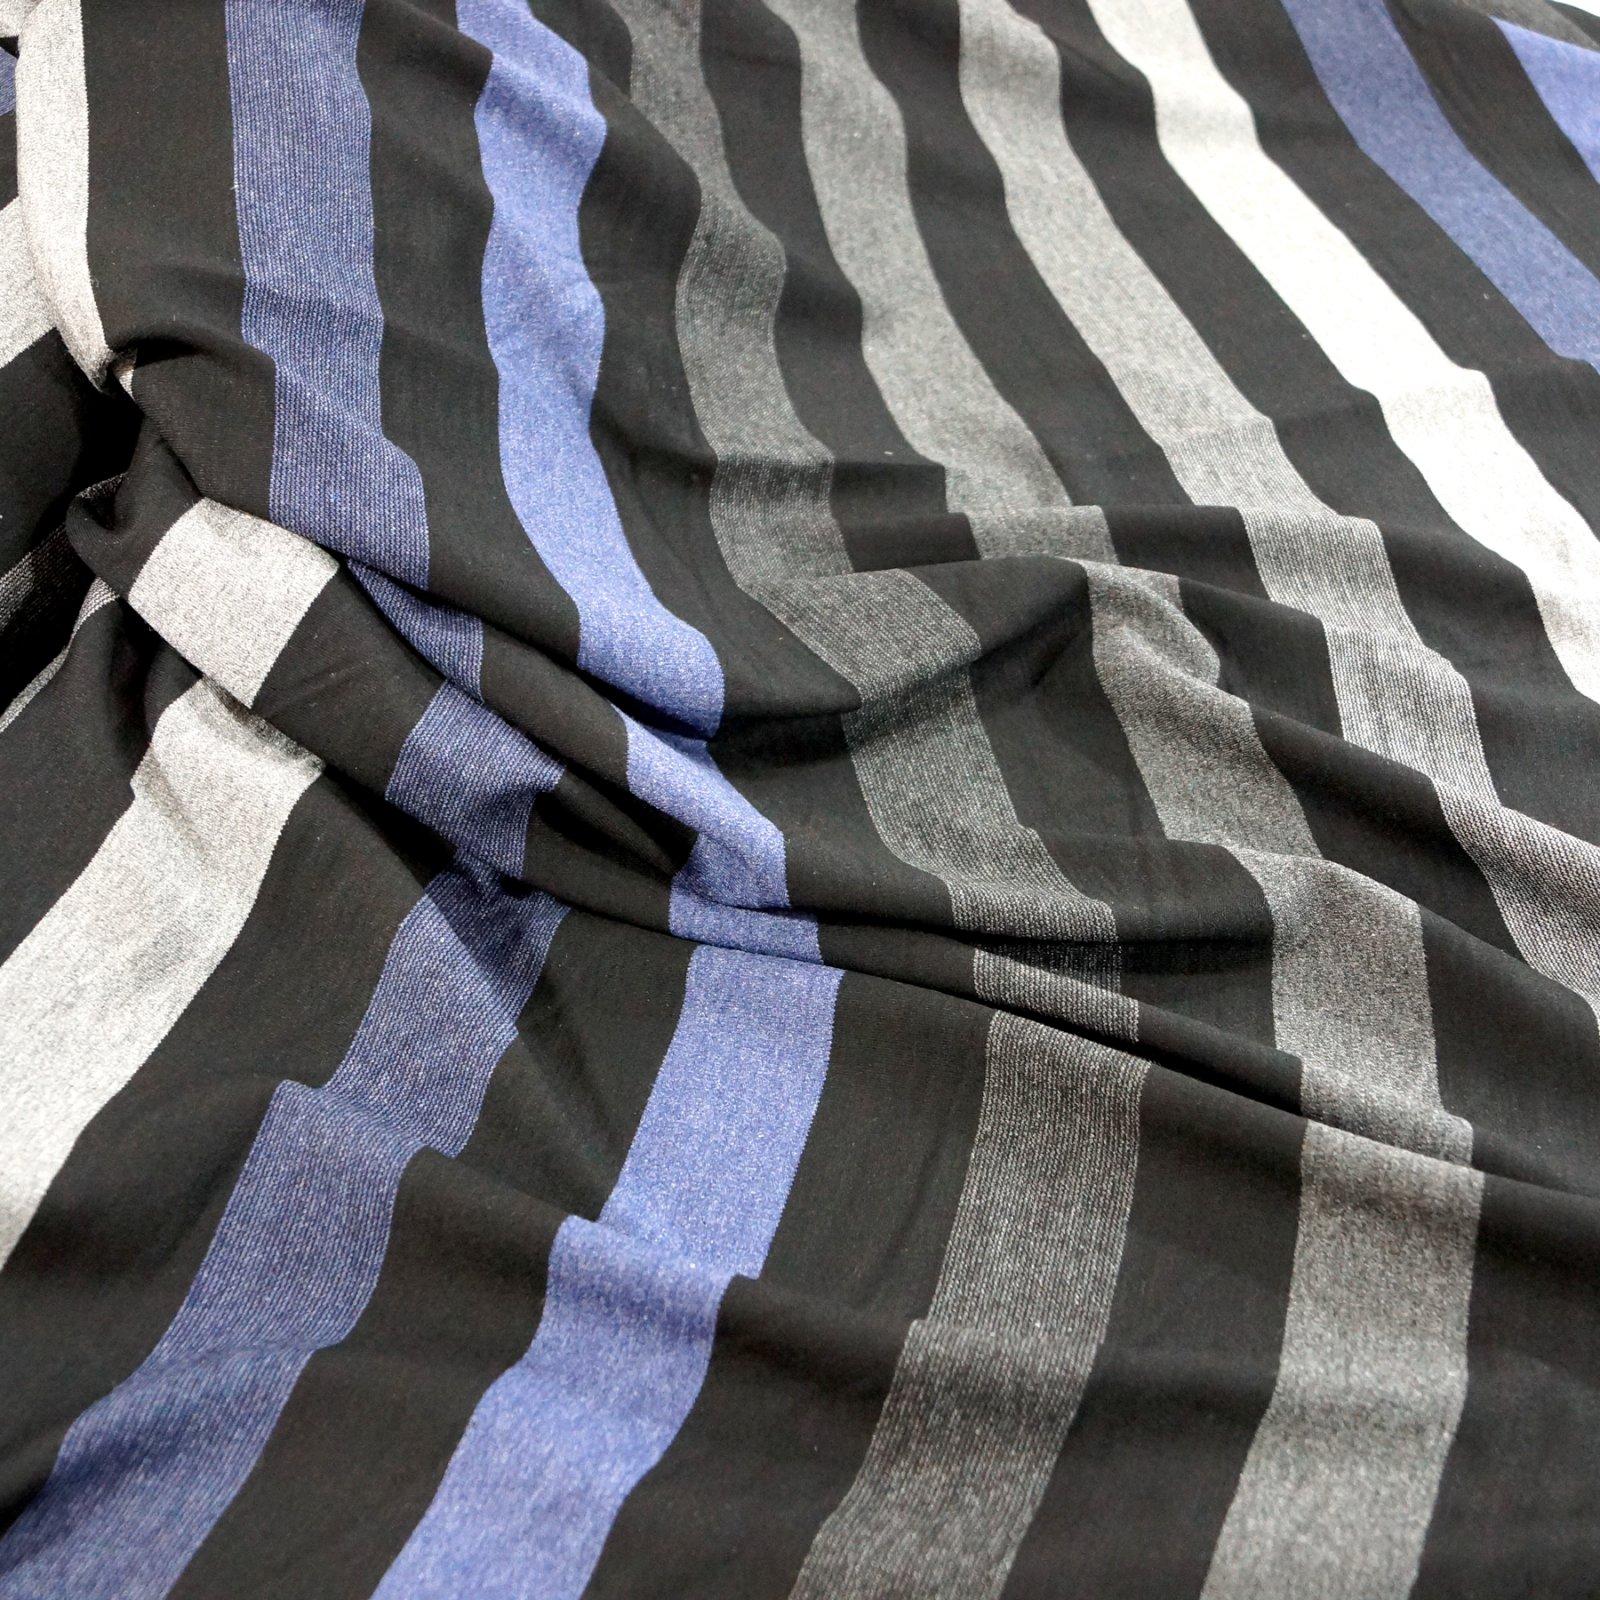 Rayon Ponte - Black, Blue, and Grays